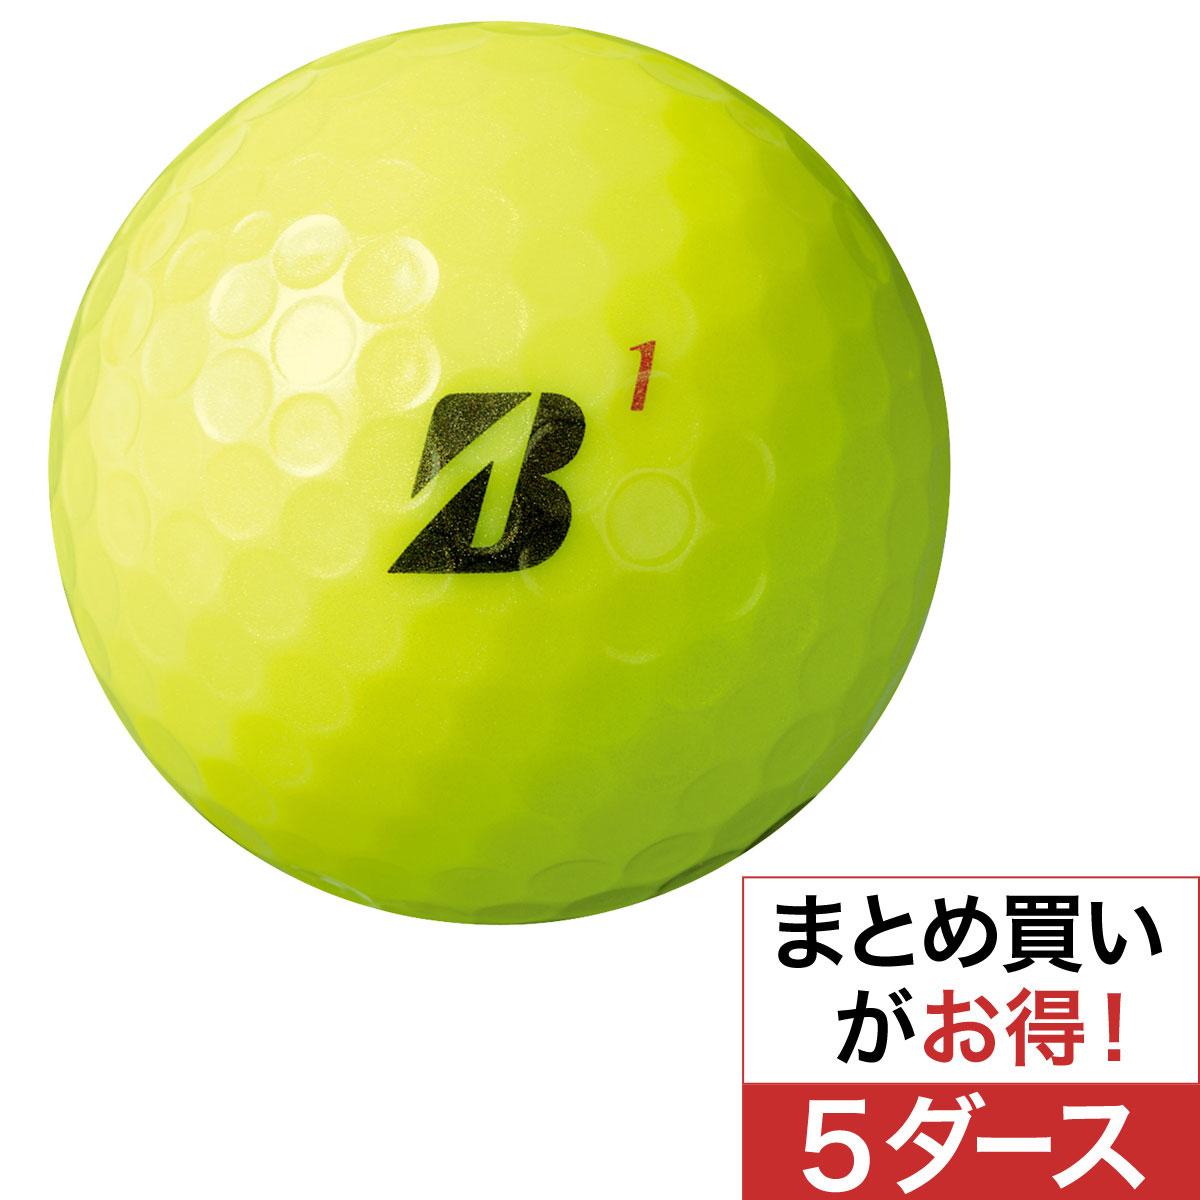 TOUR B X ボール 5ダースセット【オンネームサービス有り】(文字色:黒のみ)【2020年2月21日発売予定】